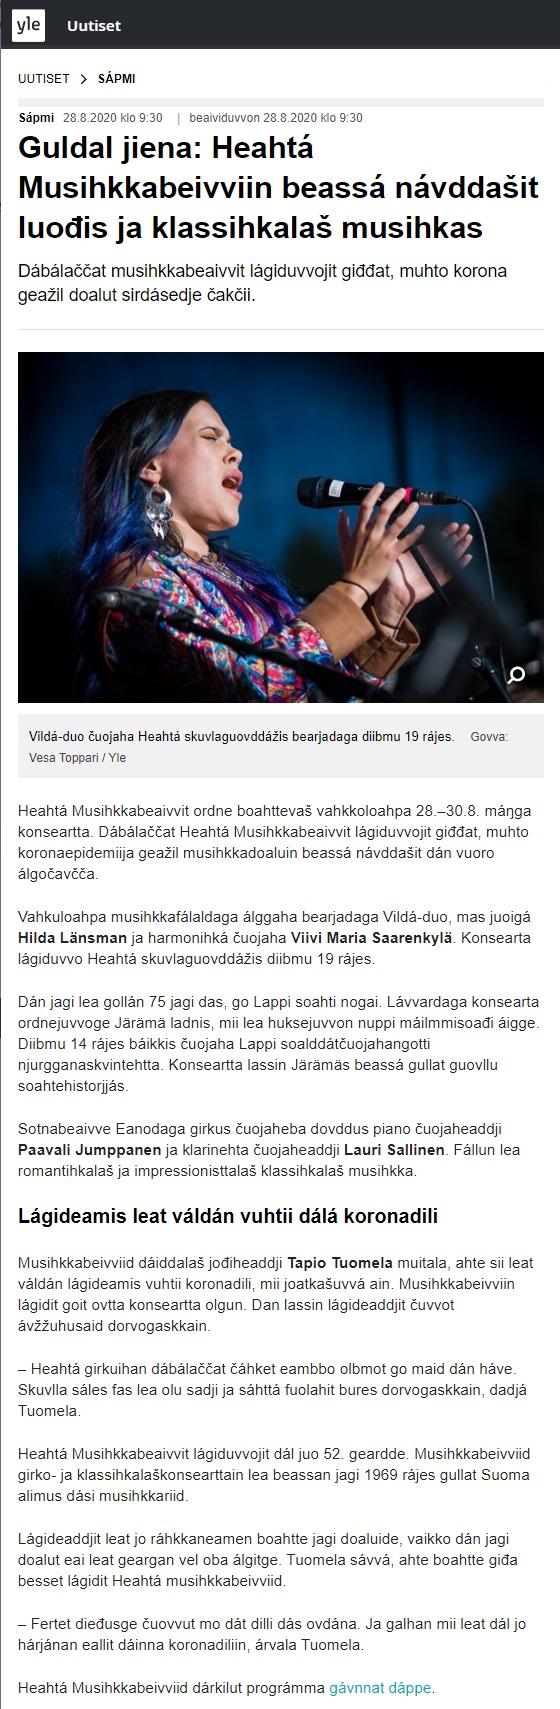 Yle Sápmi (Finland), 28.8.2020